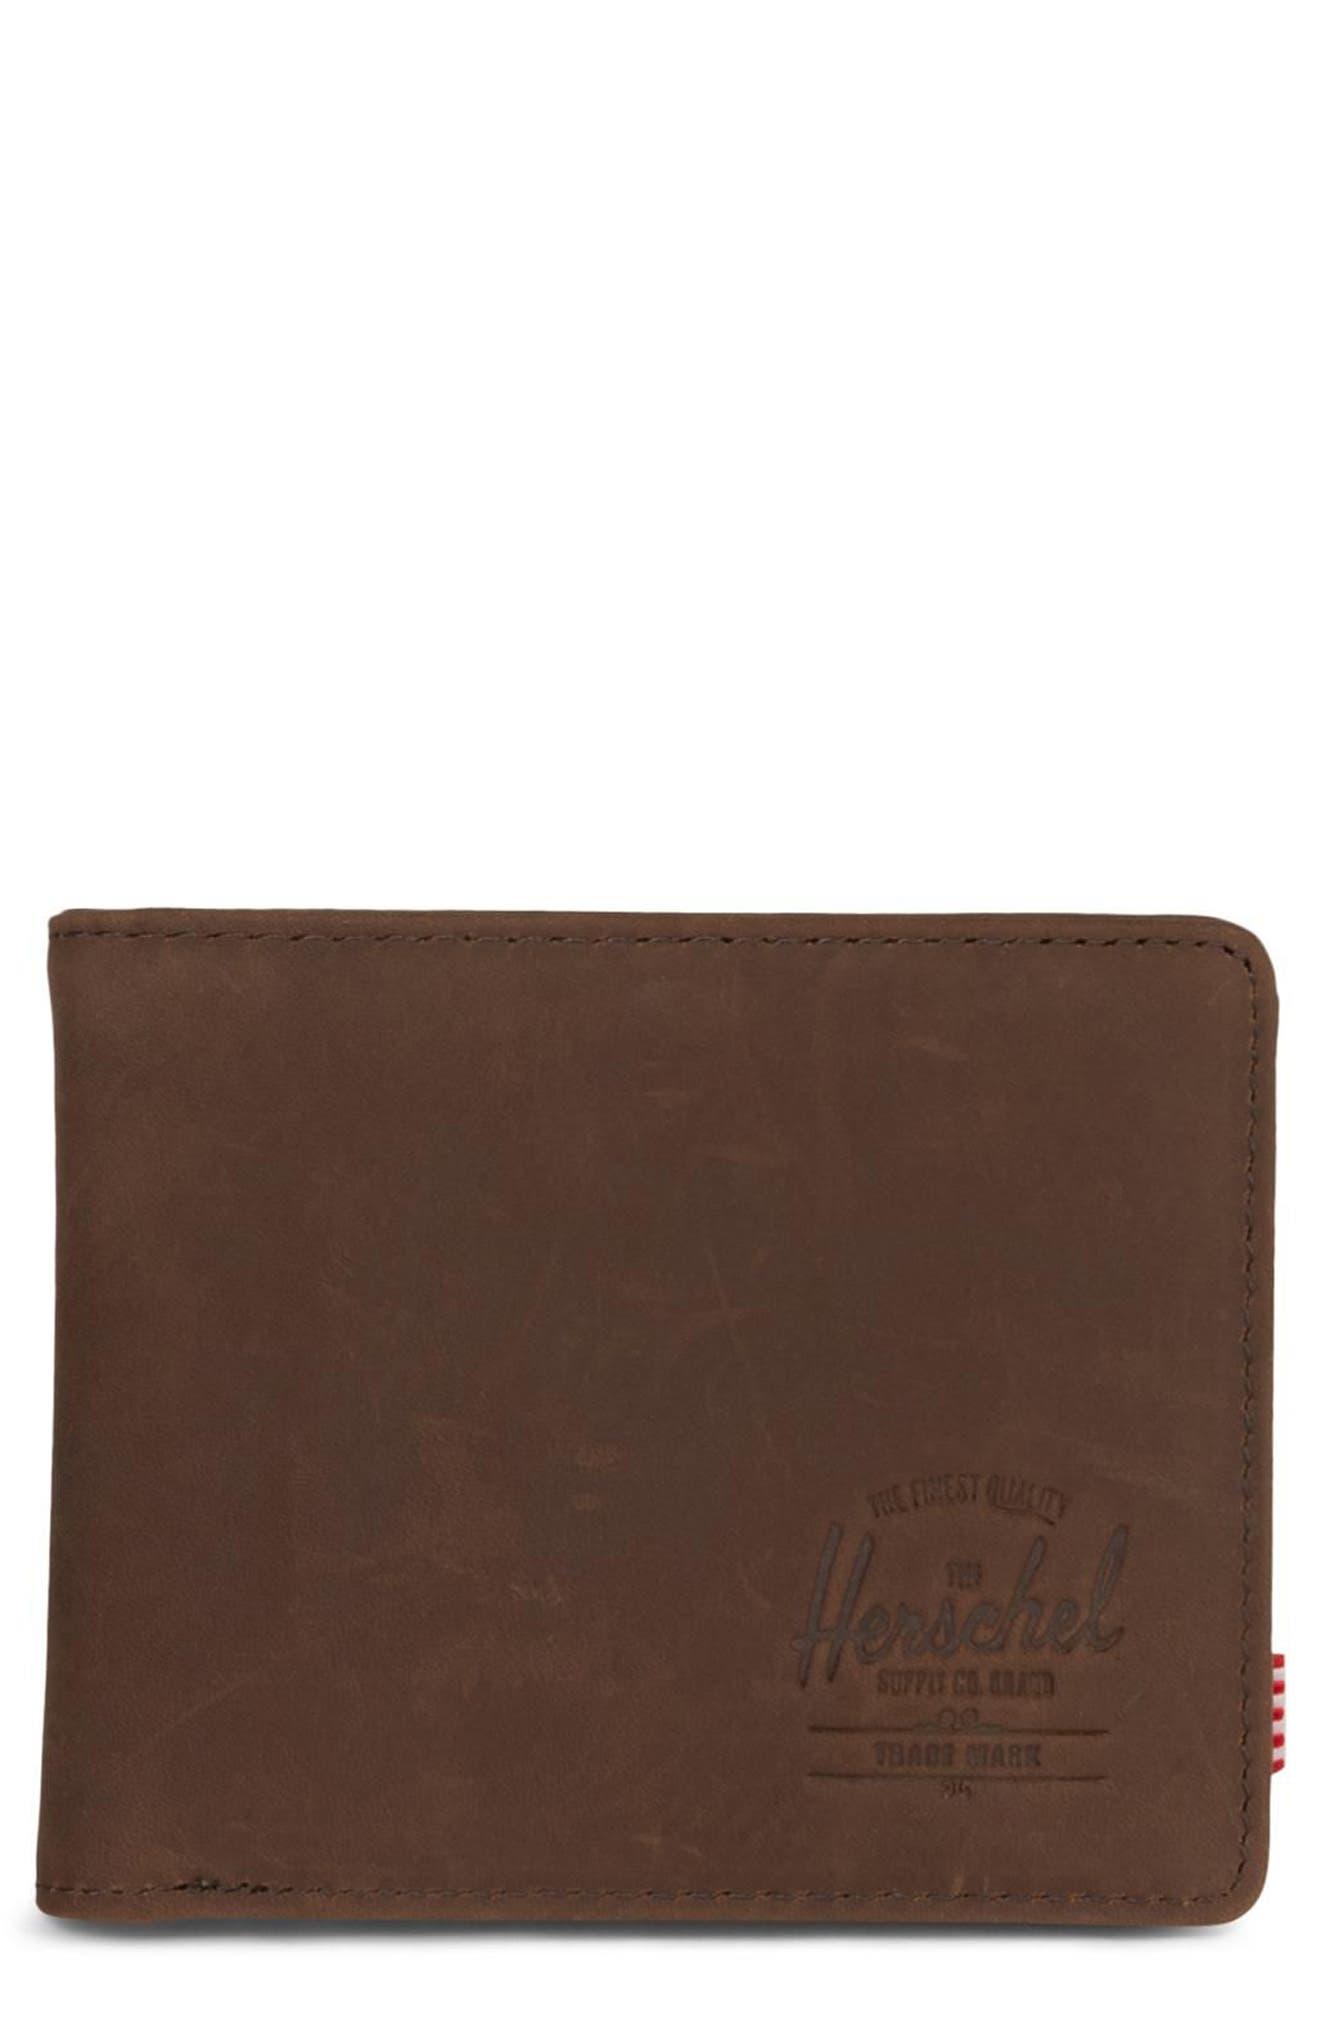 Hank Leather Wallet,                         Main,                         color, Nubuck Brown